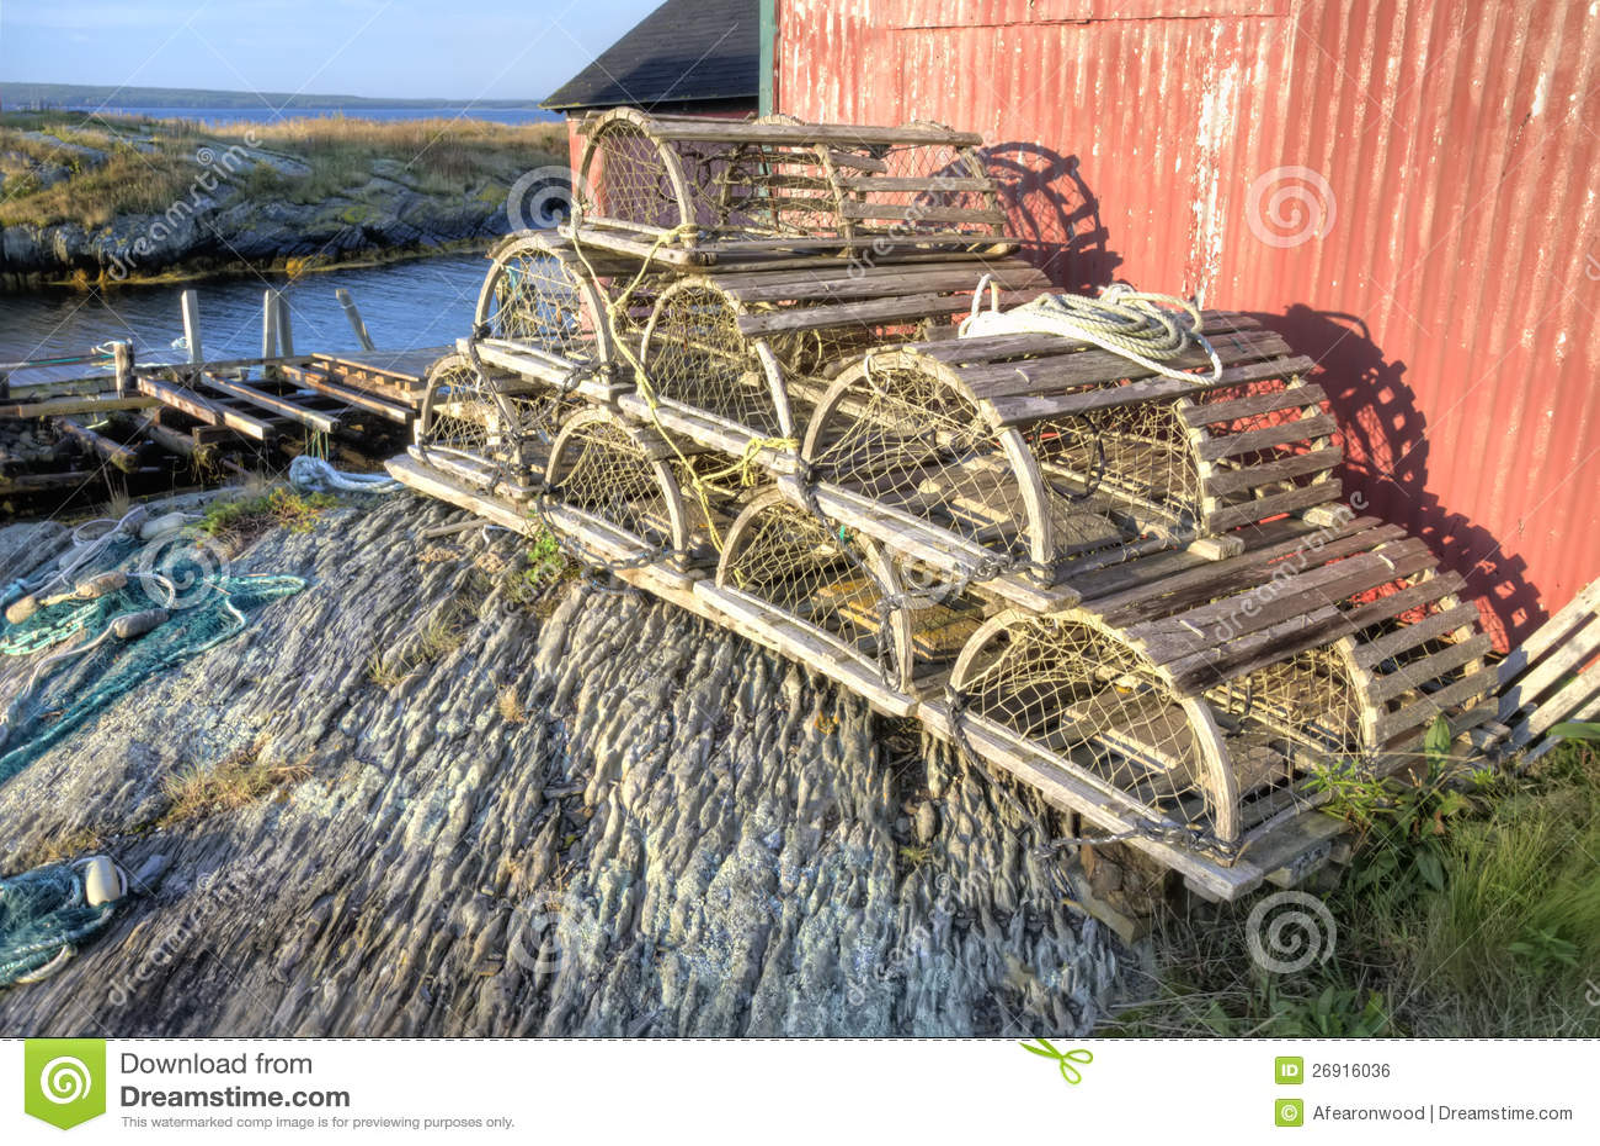 Lobster Traps, Blue Rock, Nova Scotia Royalty Free Stock Image - Image: 26916036